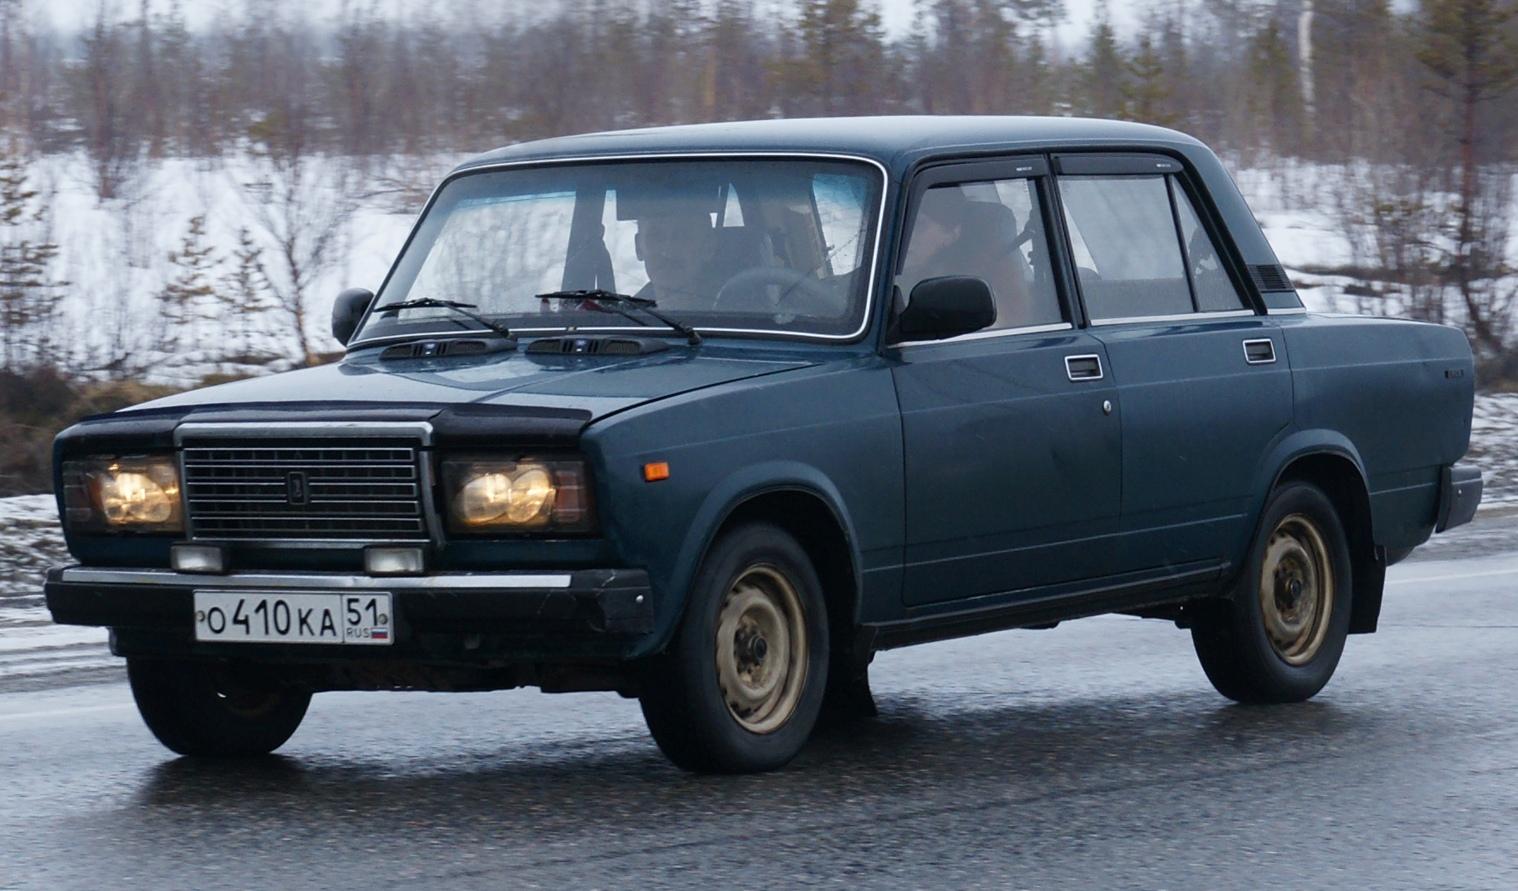 lada 2107 la fin du mythe automobile russe. Black Bedroom Furniture Sets. Home Design Ideas